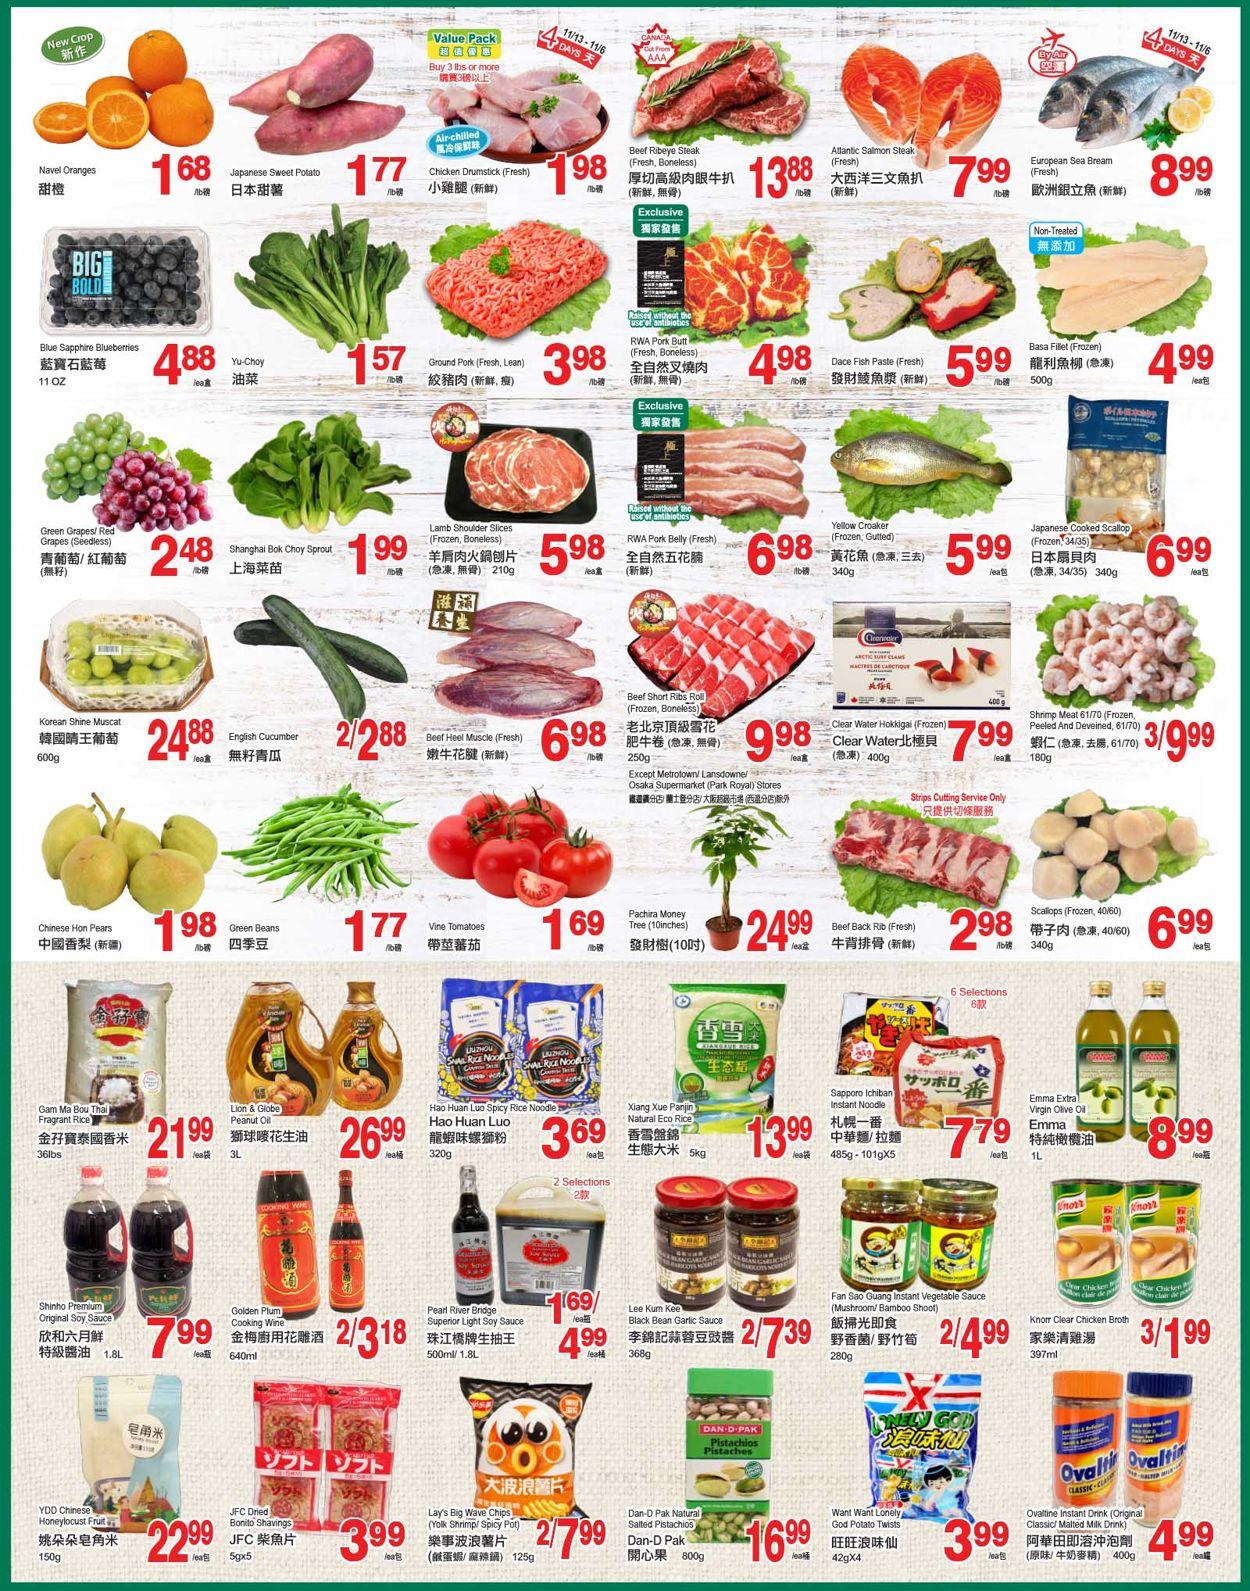 T&T Supermarket - British Columbia Flyer - 11/13-11/19/2020 (Page 2)